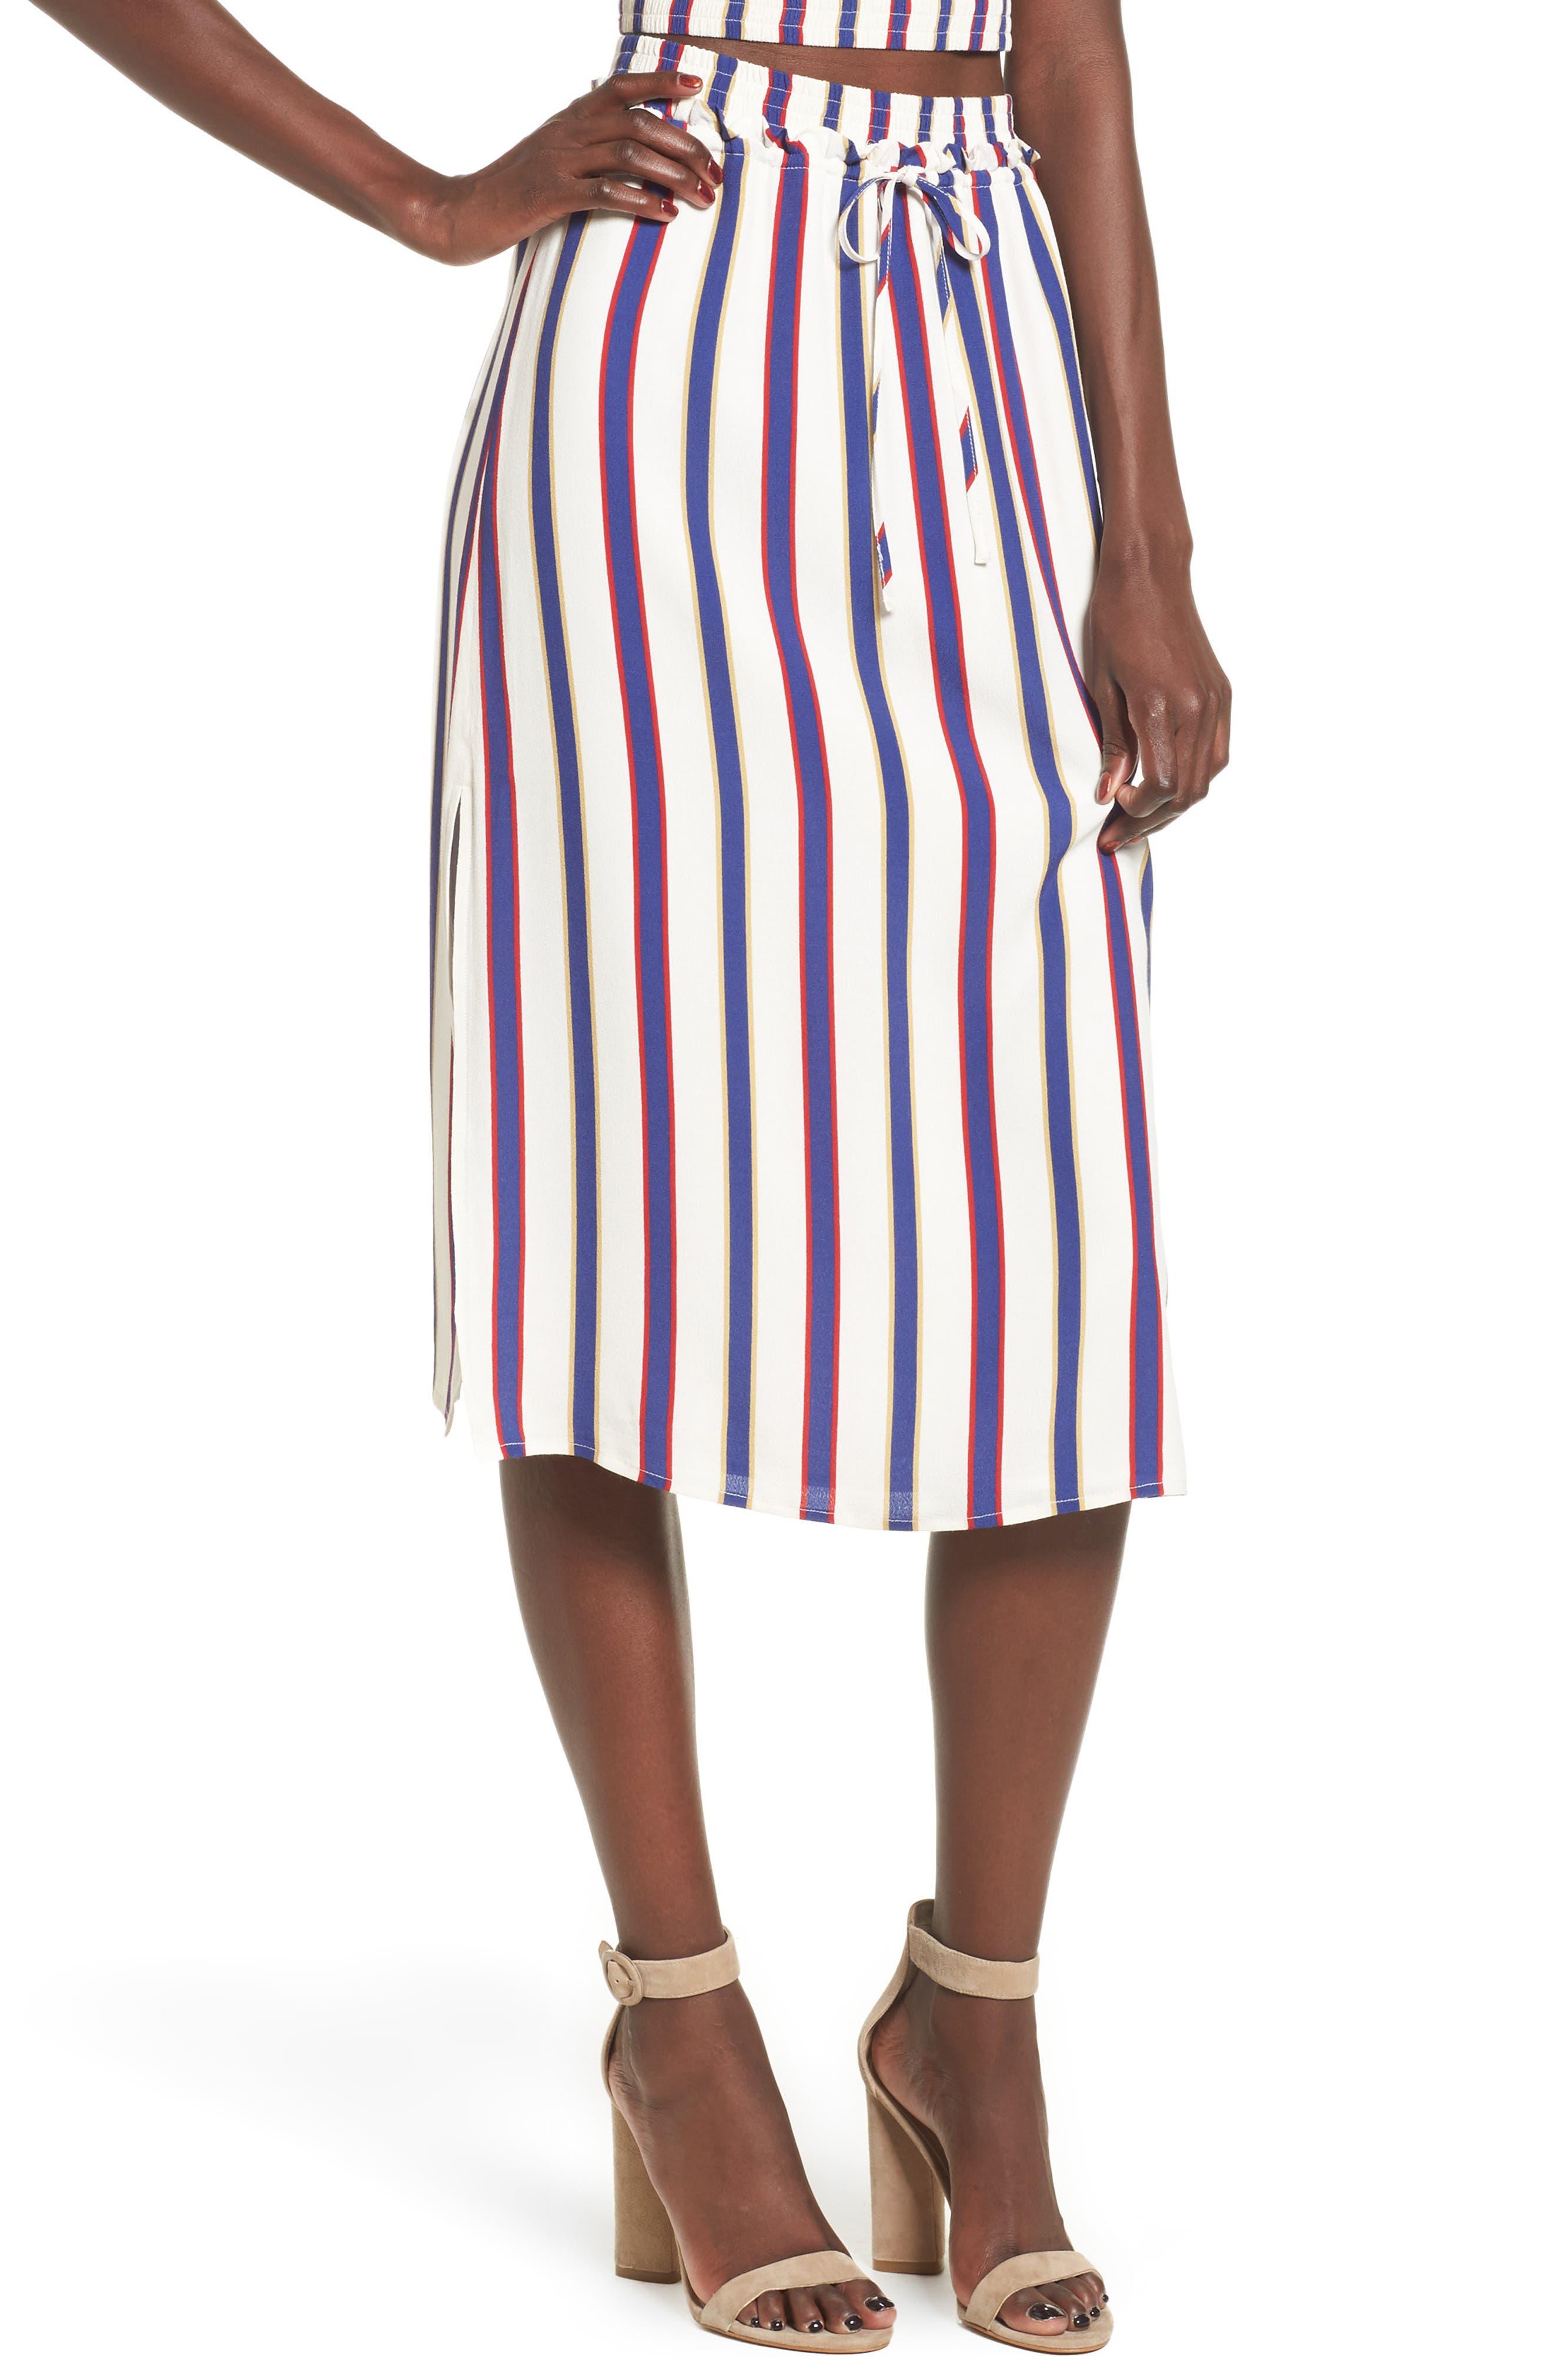 Privacy Please Stripe High Waist Skirt